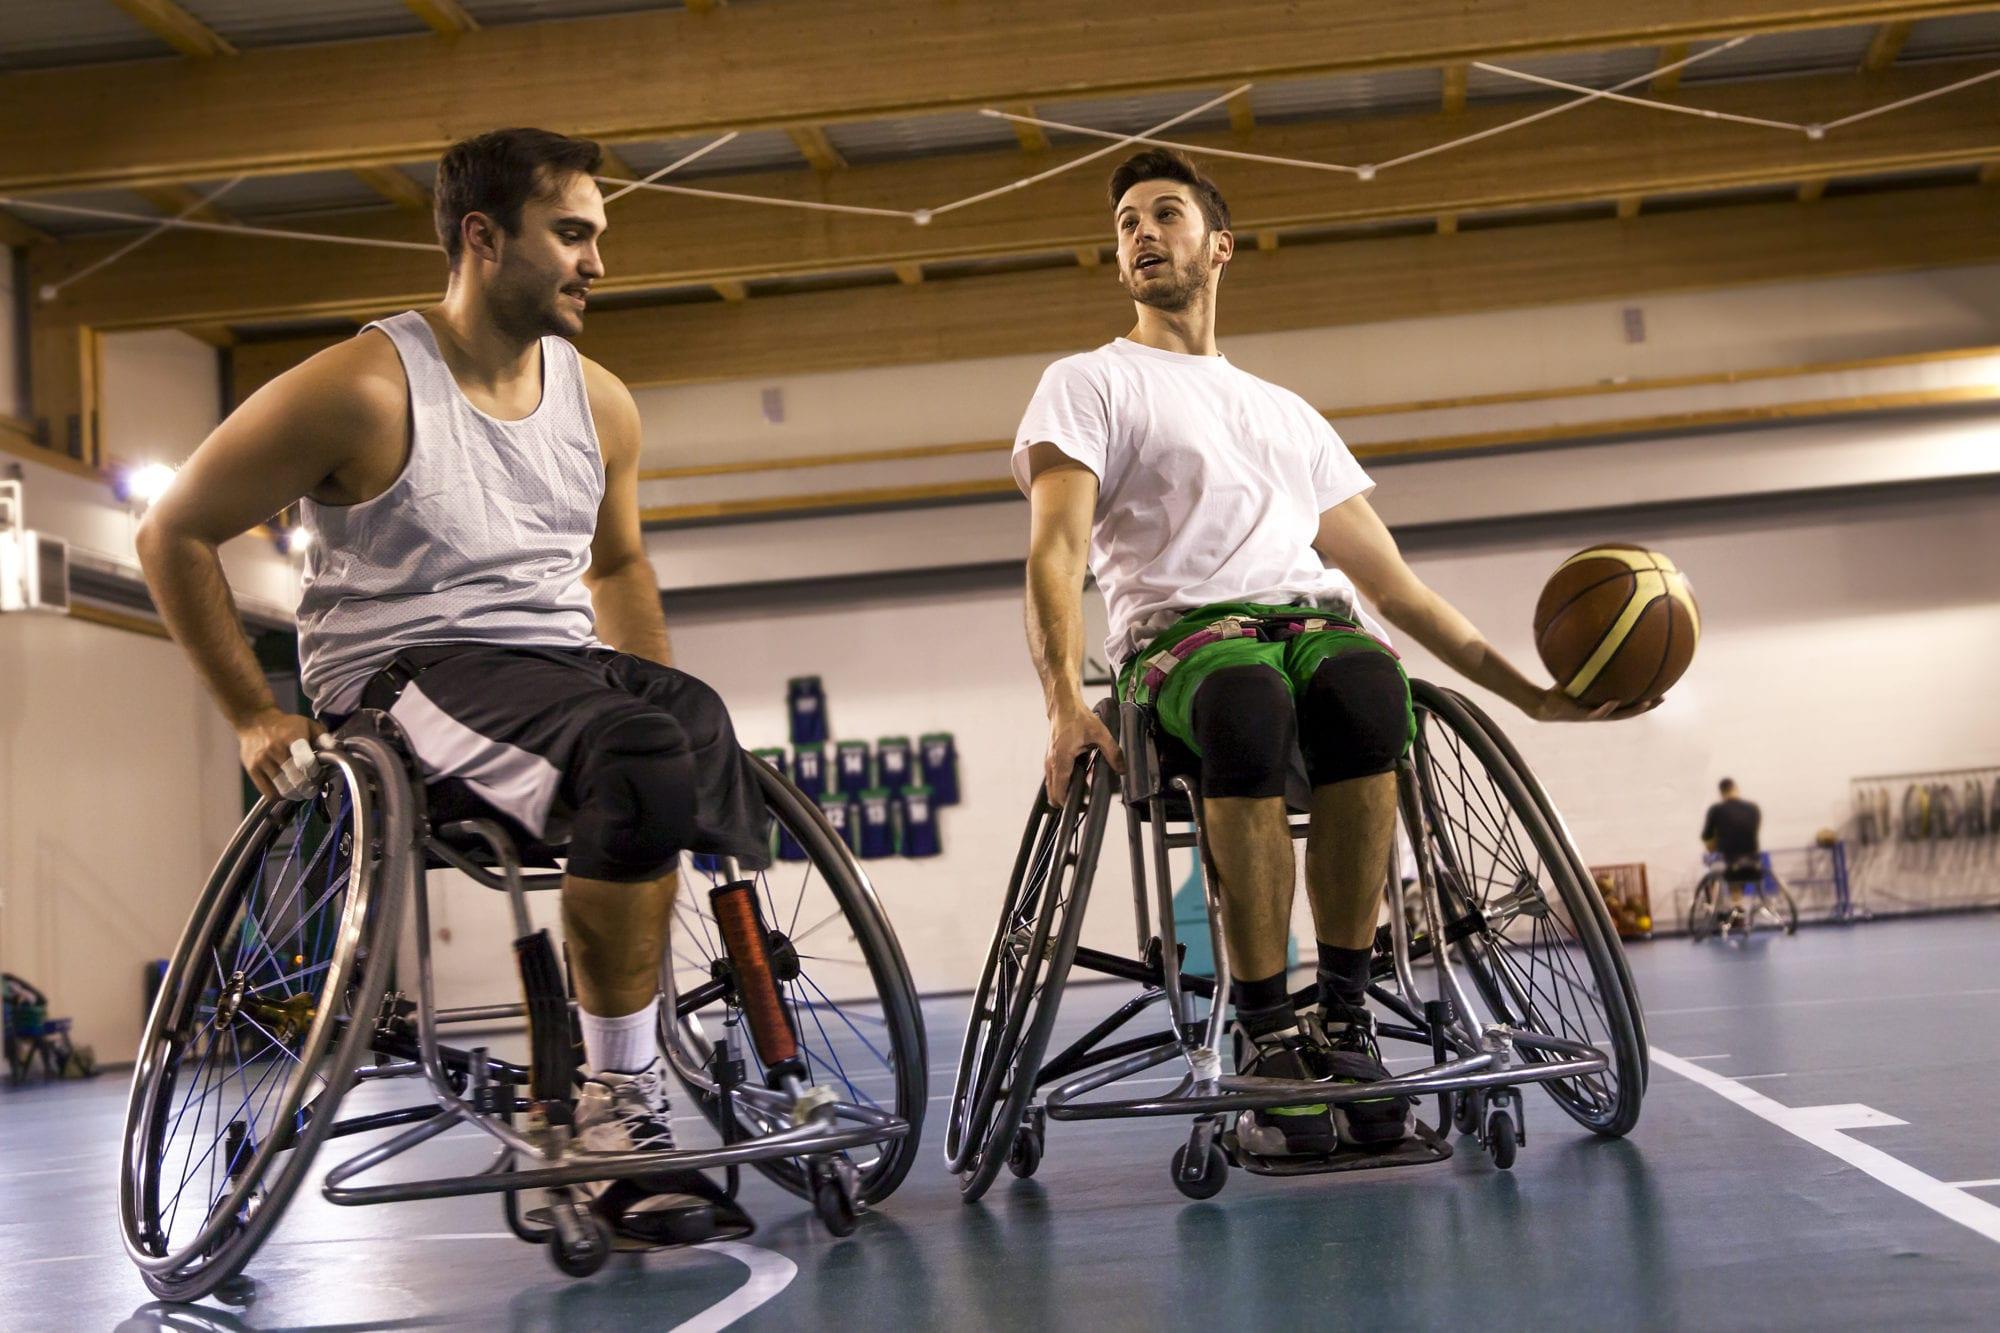 Disabled Sports: Men playing wheelchair basketball at SADI